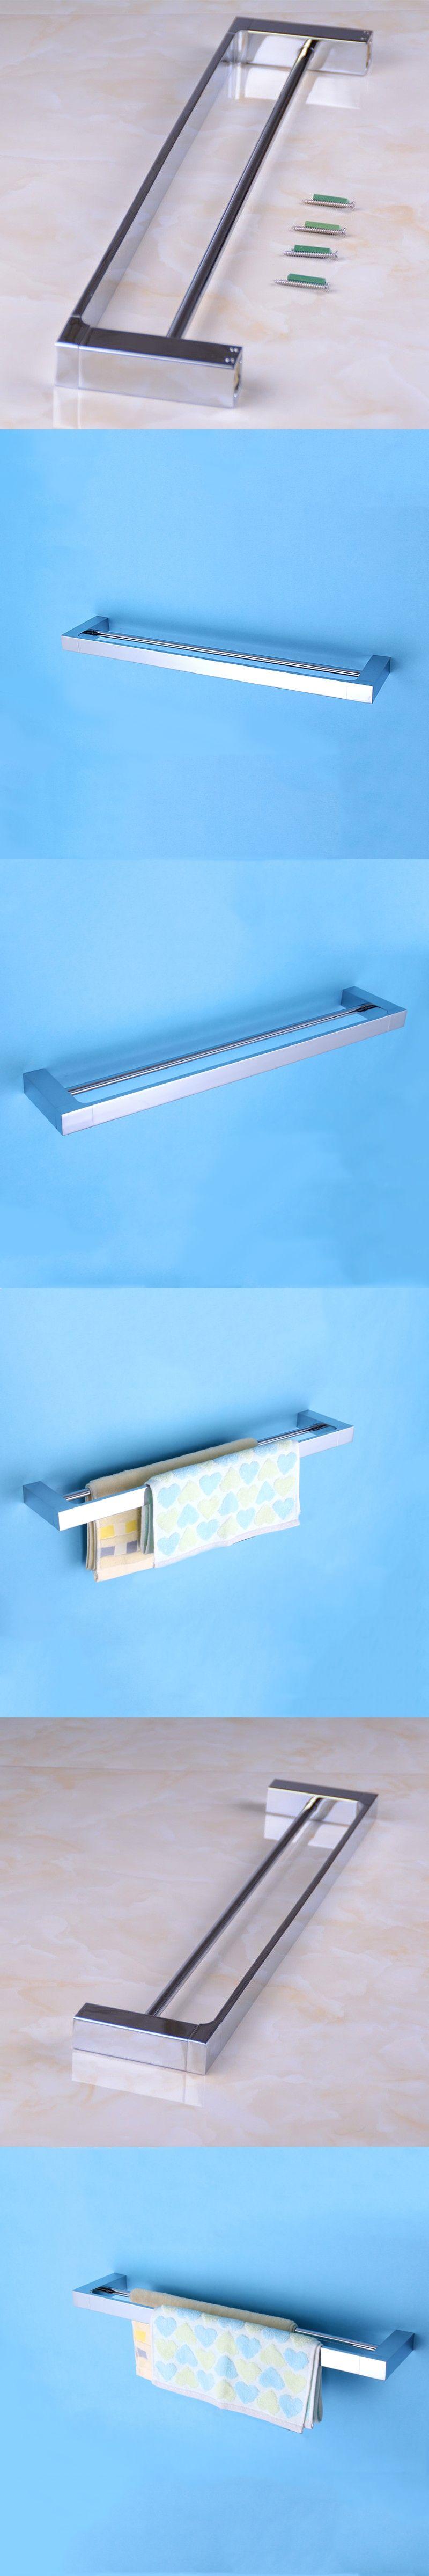 Luxury 3 Tier Towel Rack Ideas - Bathtub Design Ideas - klotsnet.com